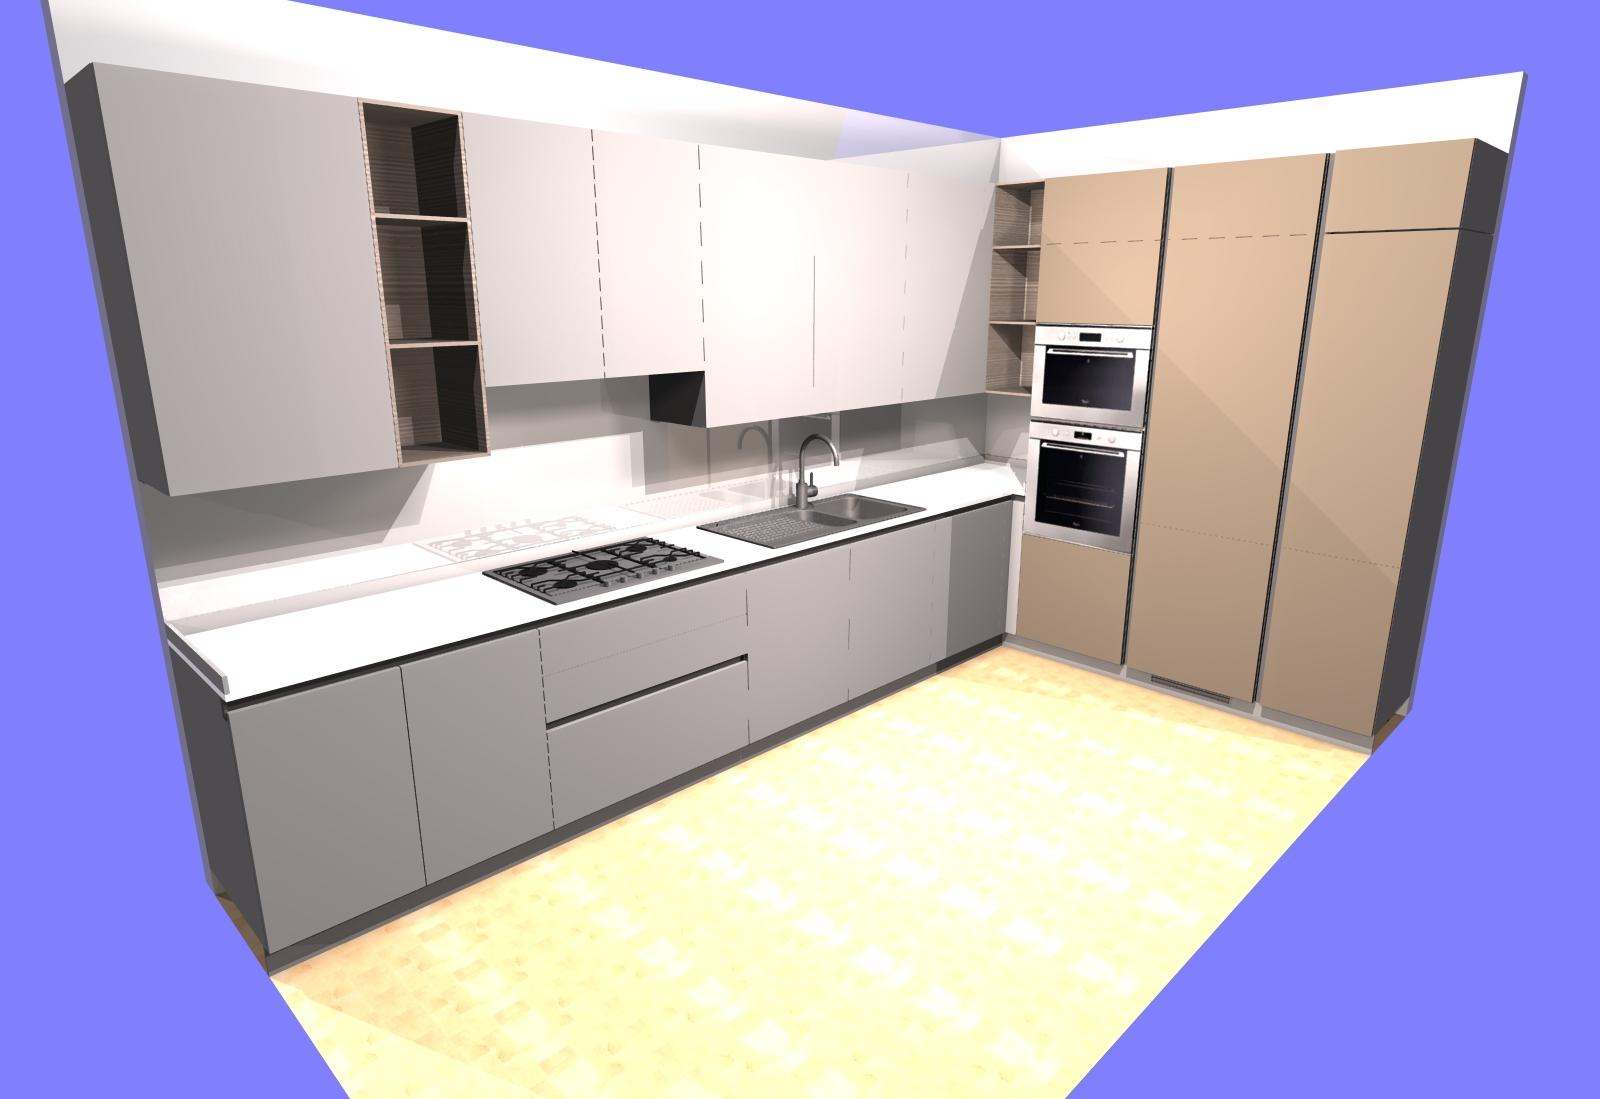 Casa dolce Casa: Ecco la nostra cucina